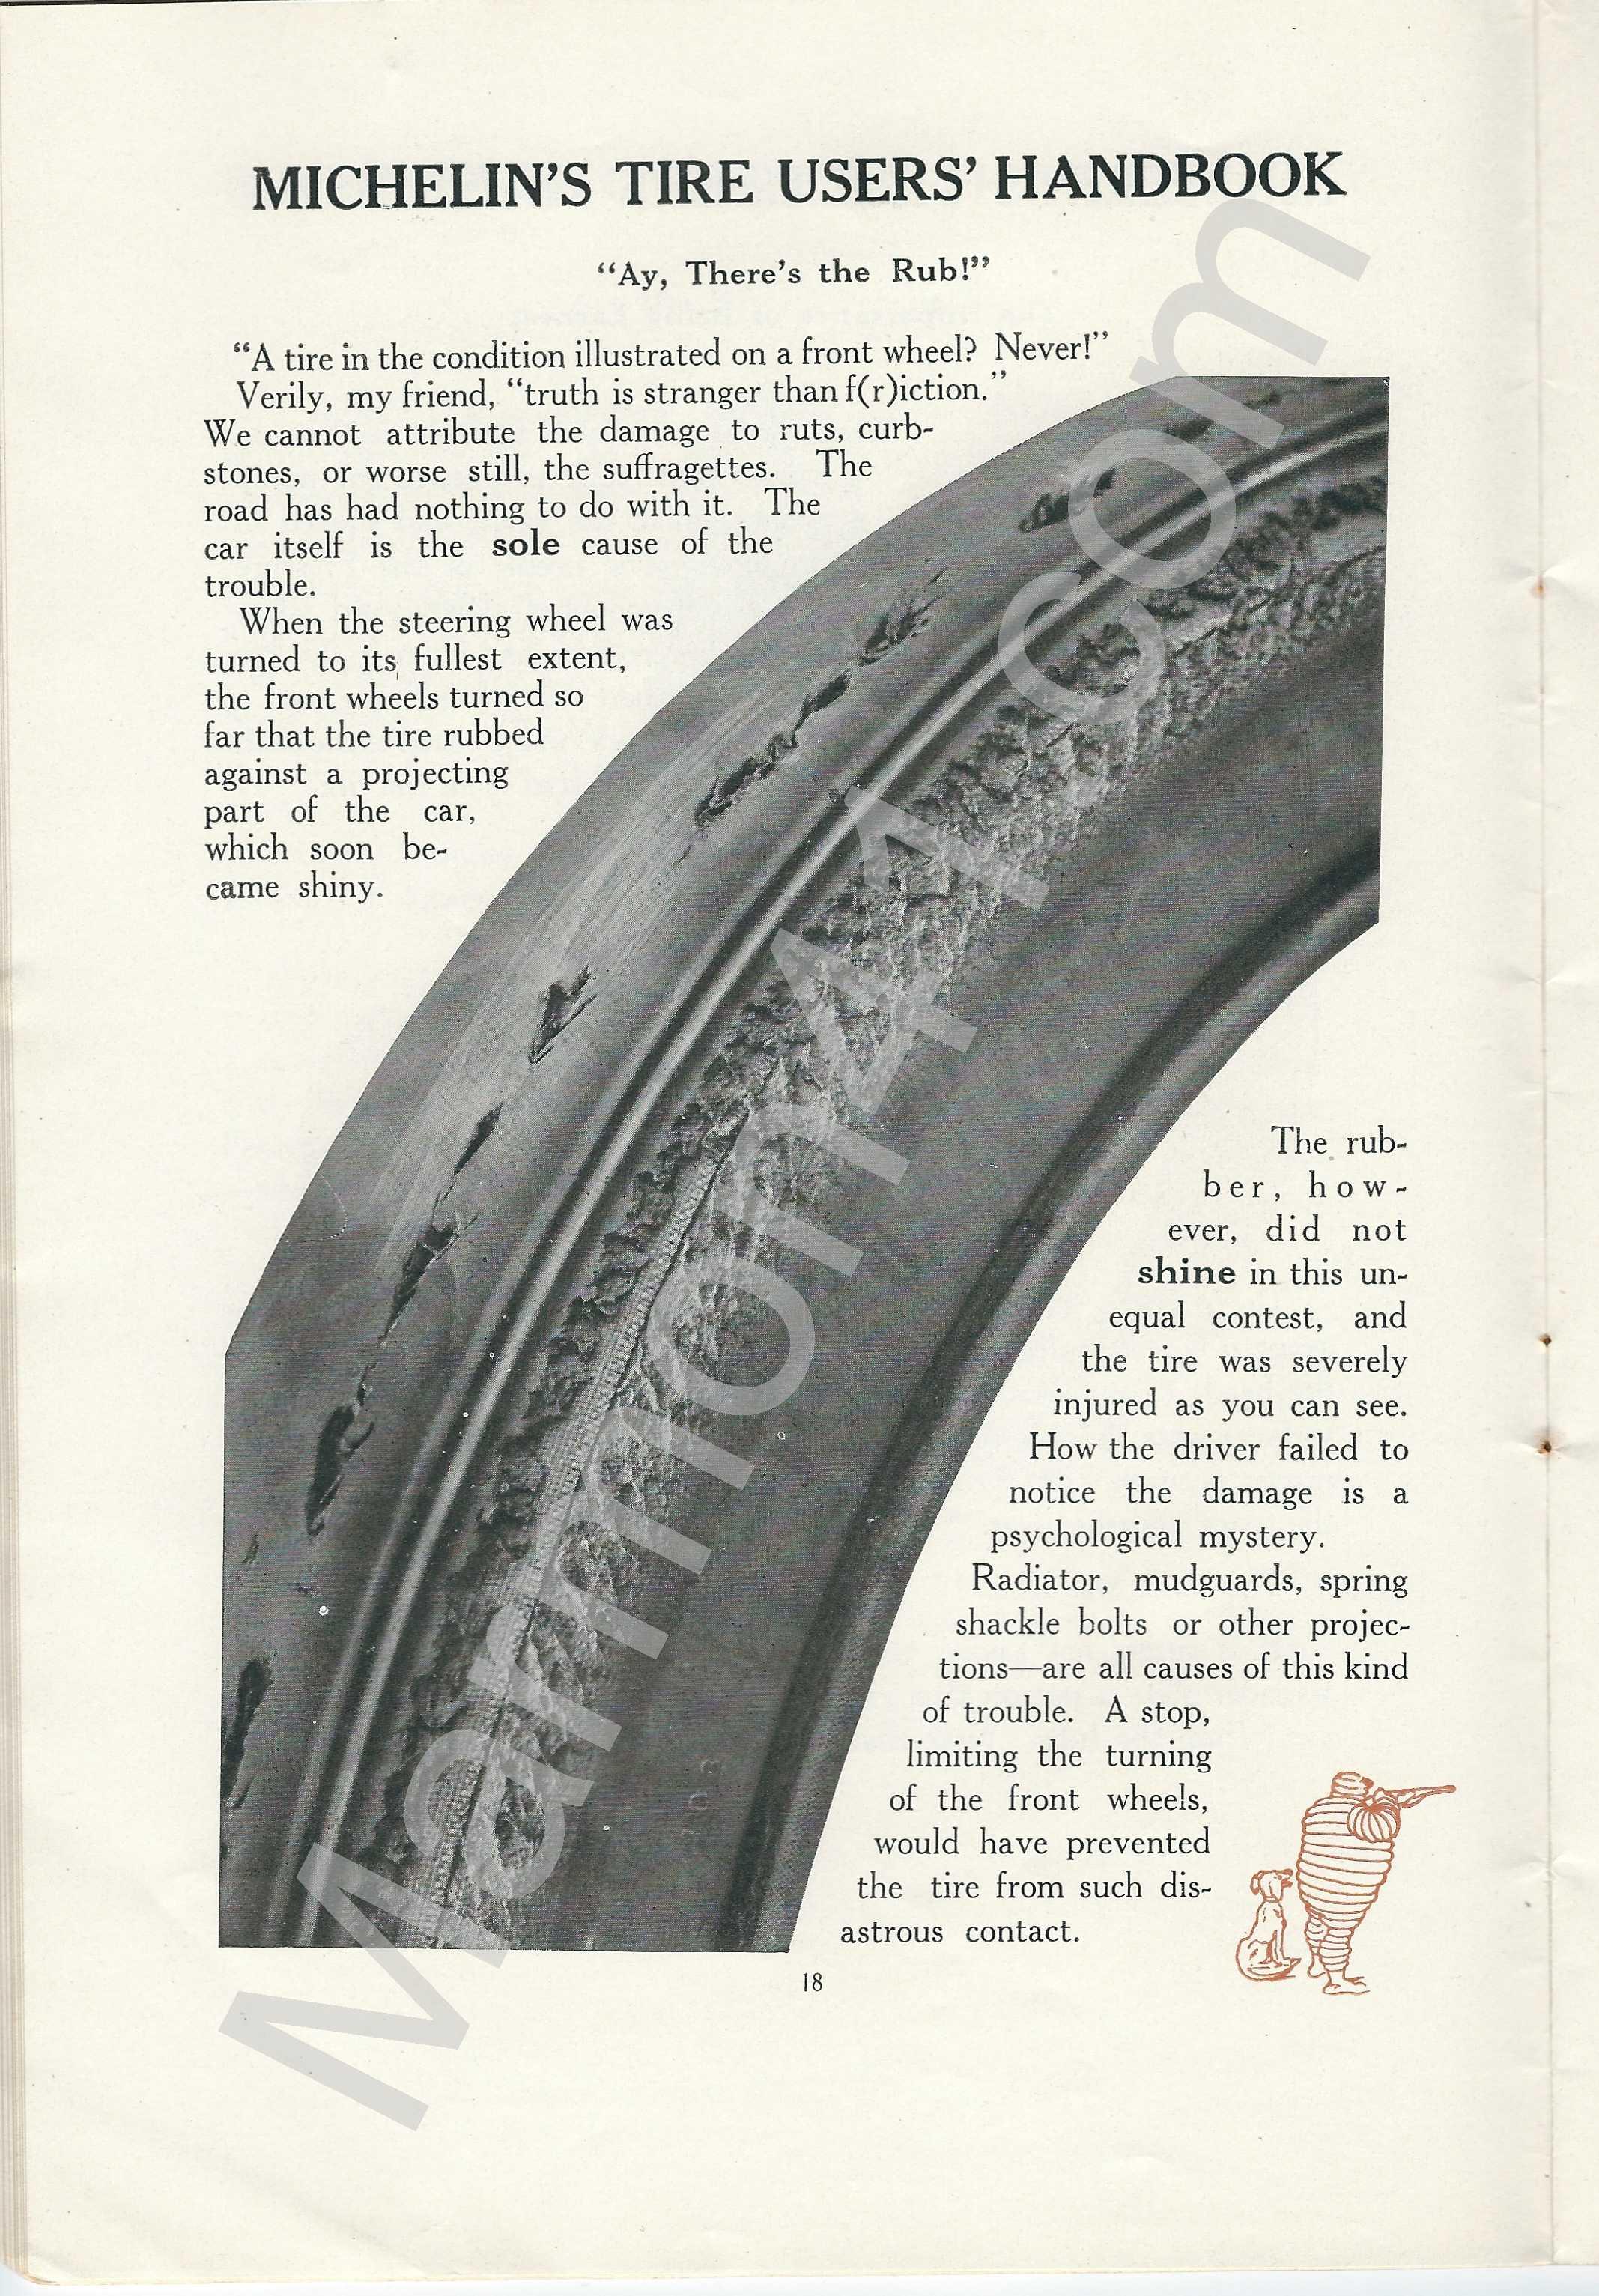 Michelins Tire Users Handbook_19